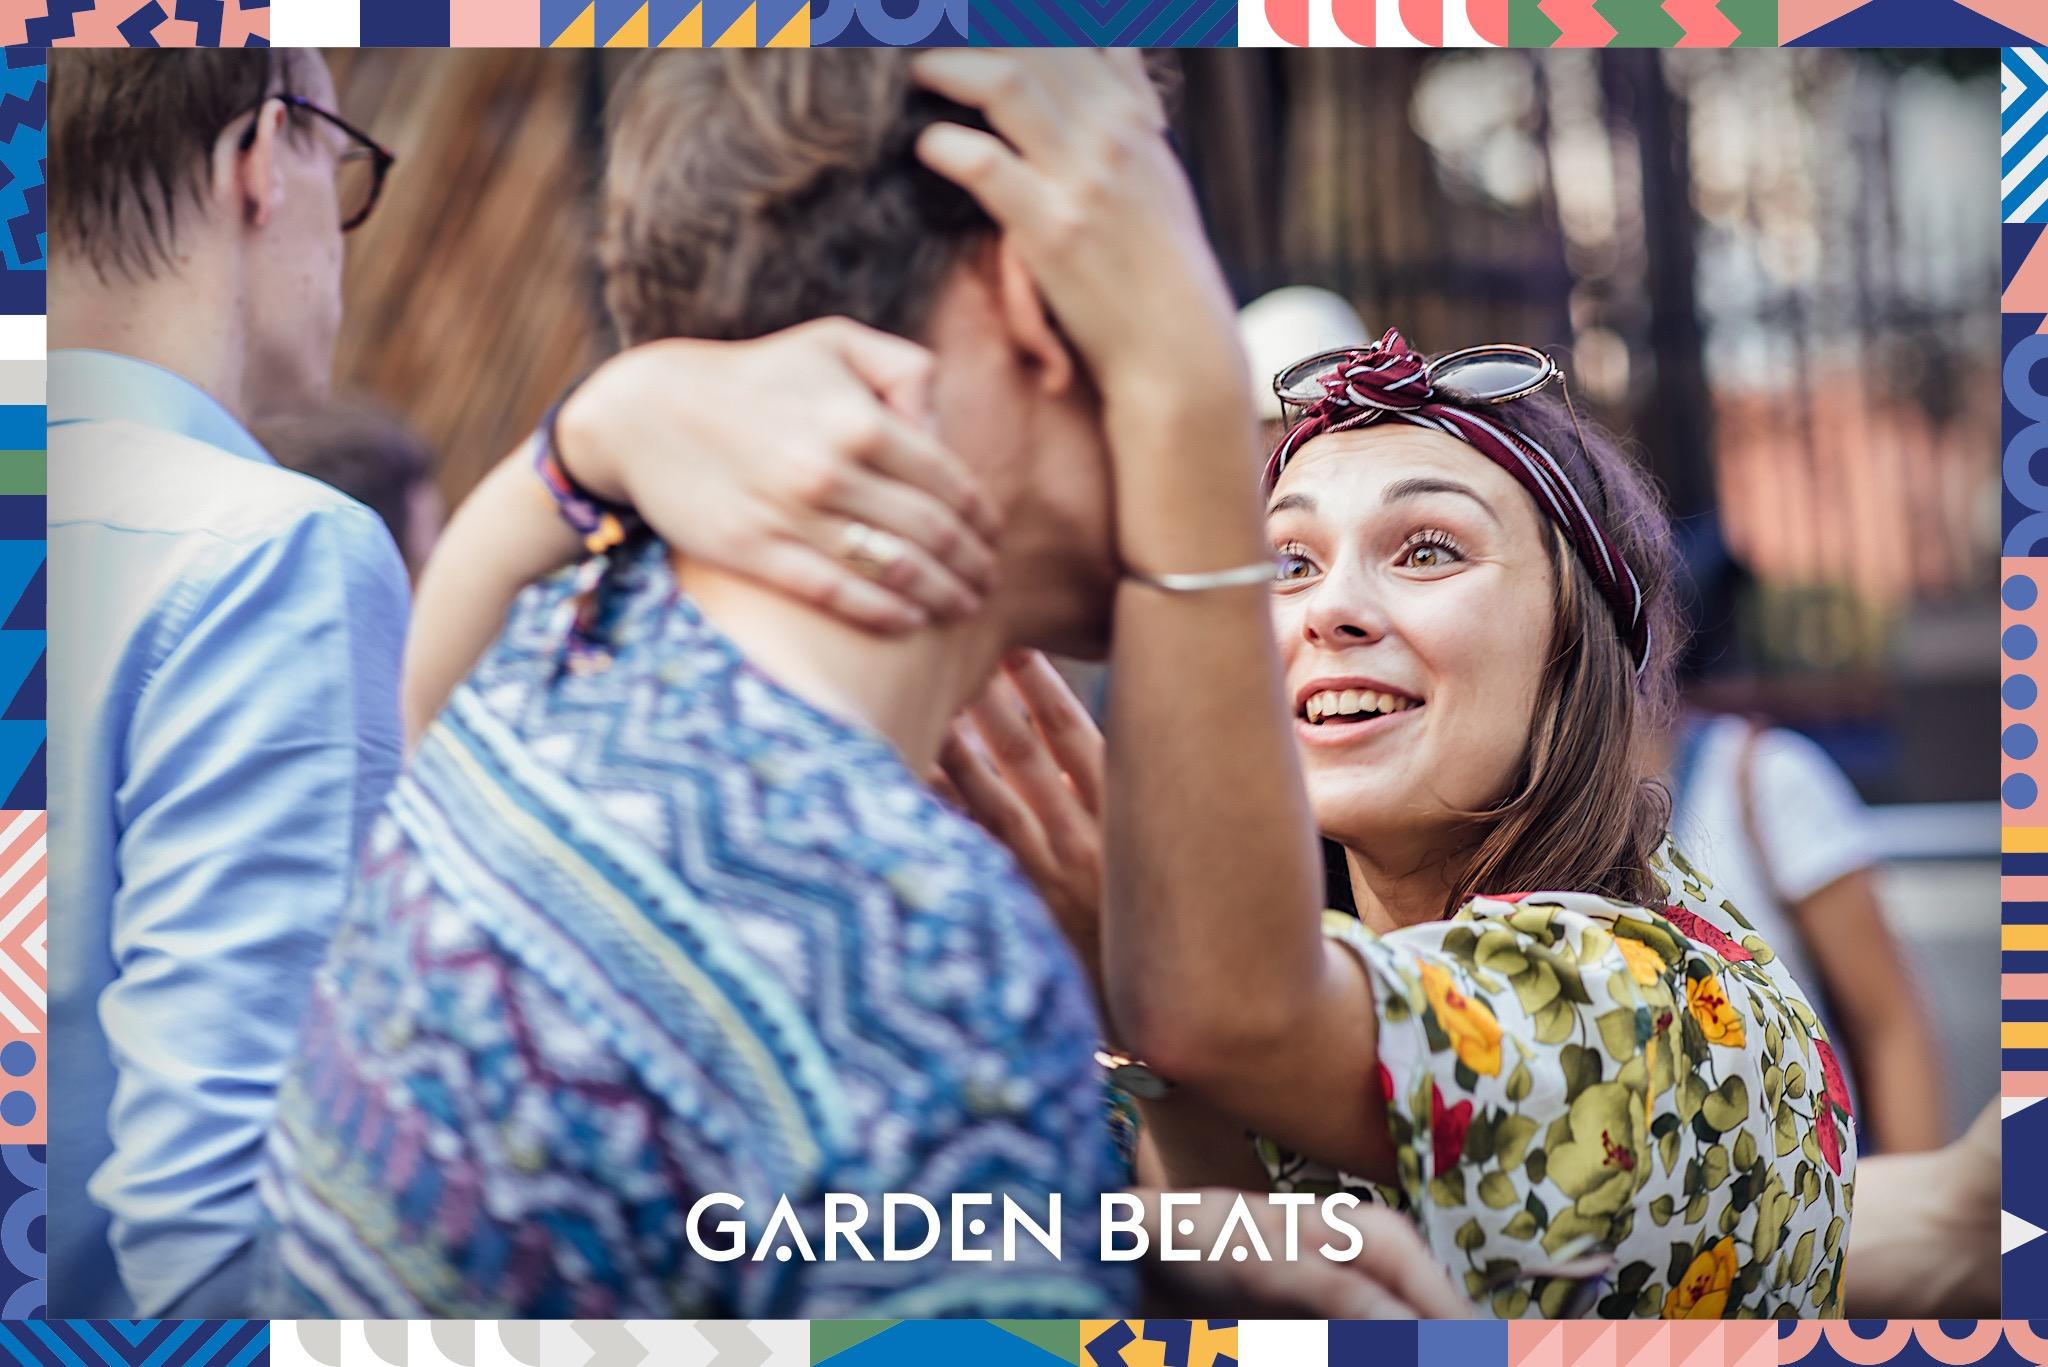 18032017_GardenBeats_Colossal580_WatermarkedGB.jpg